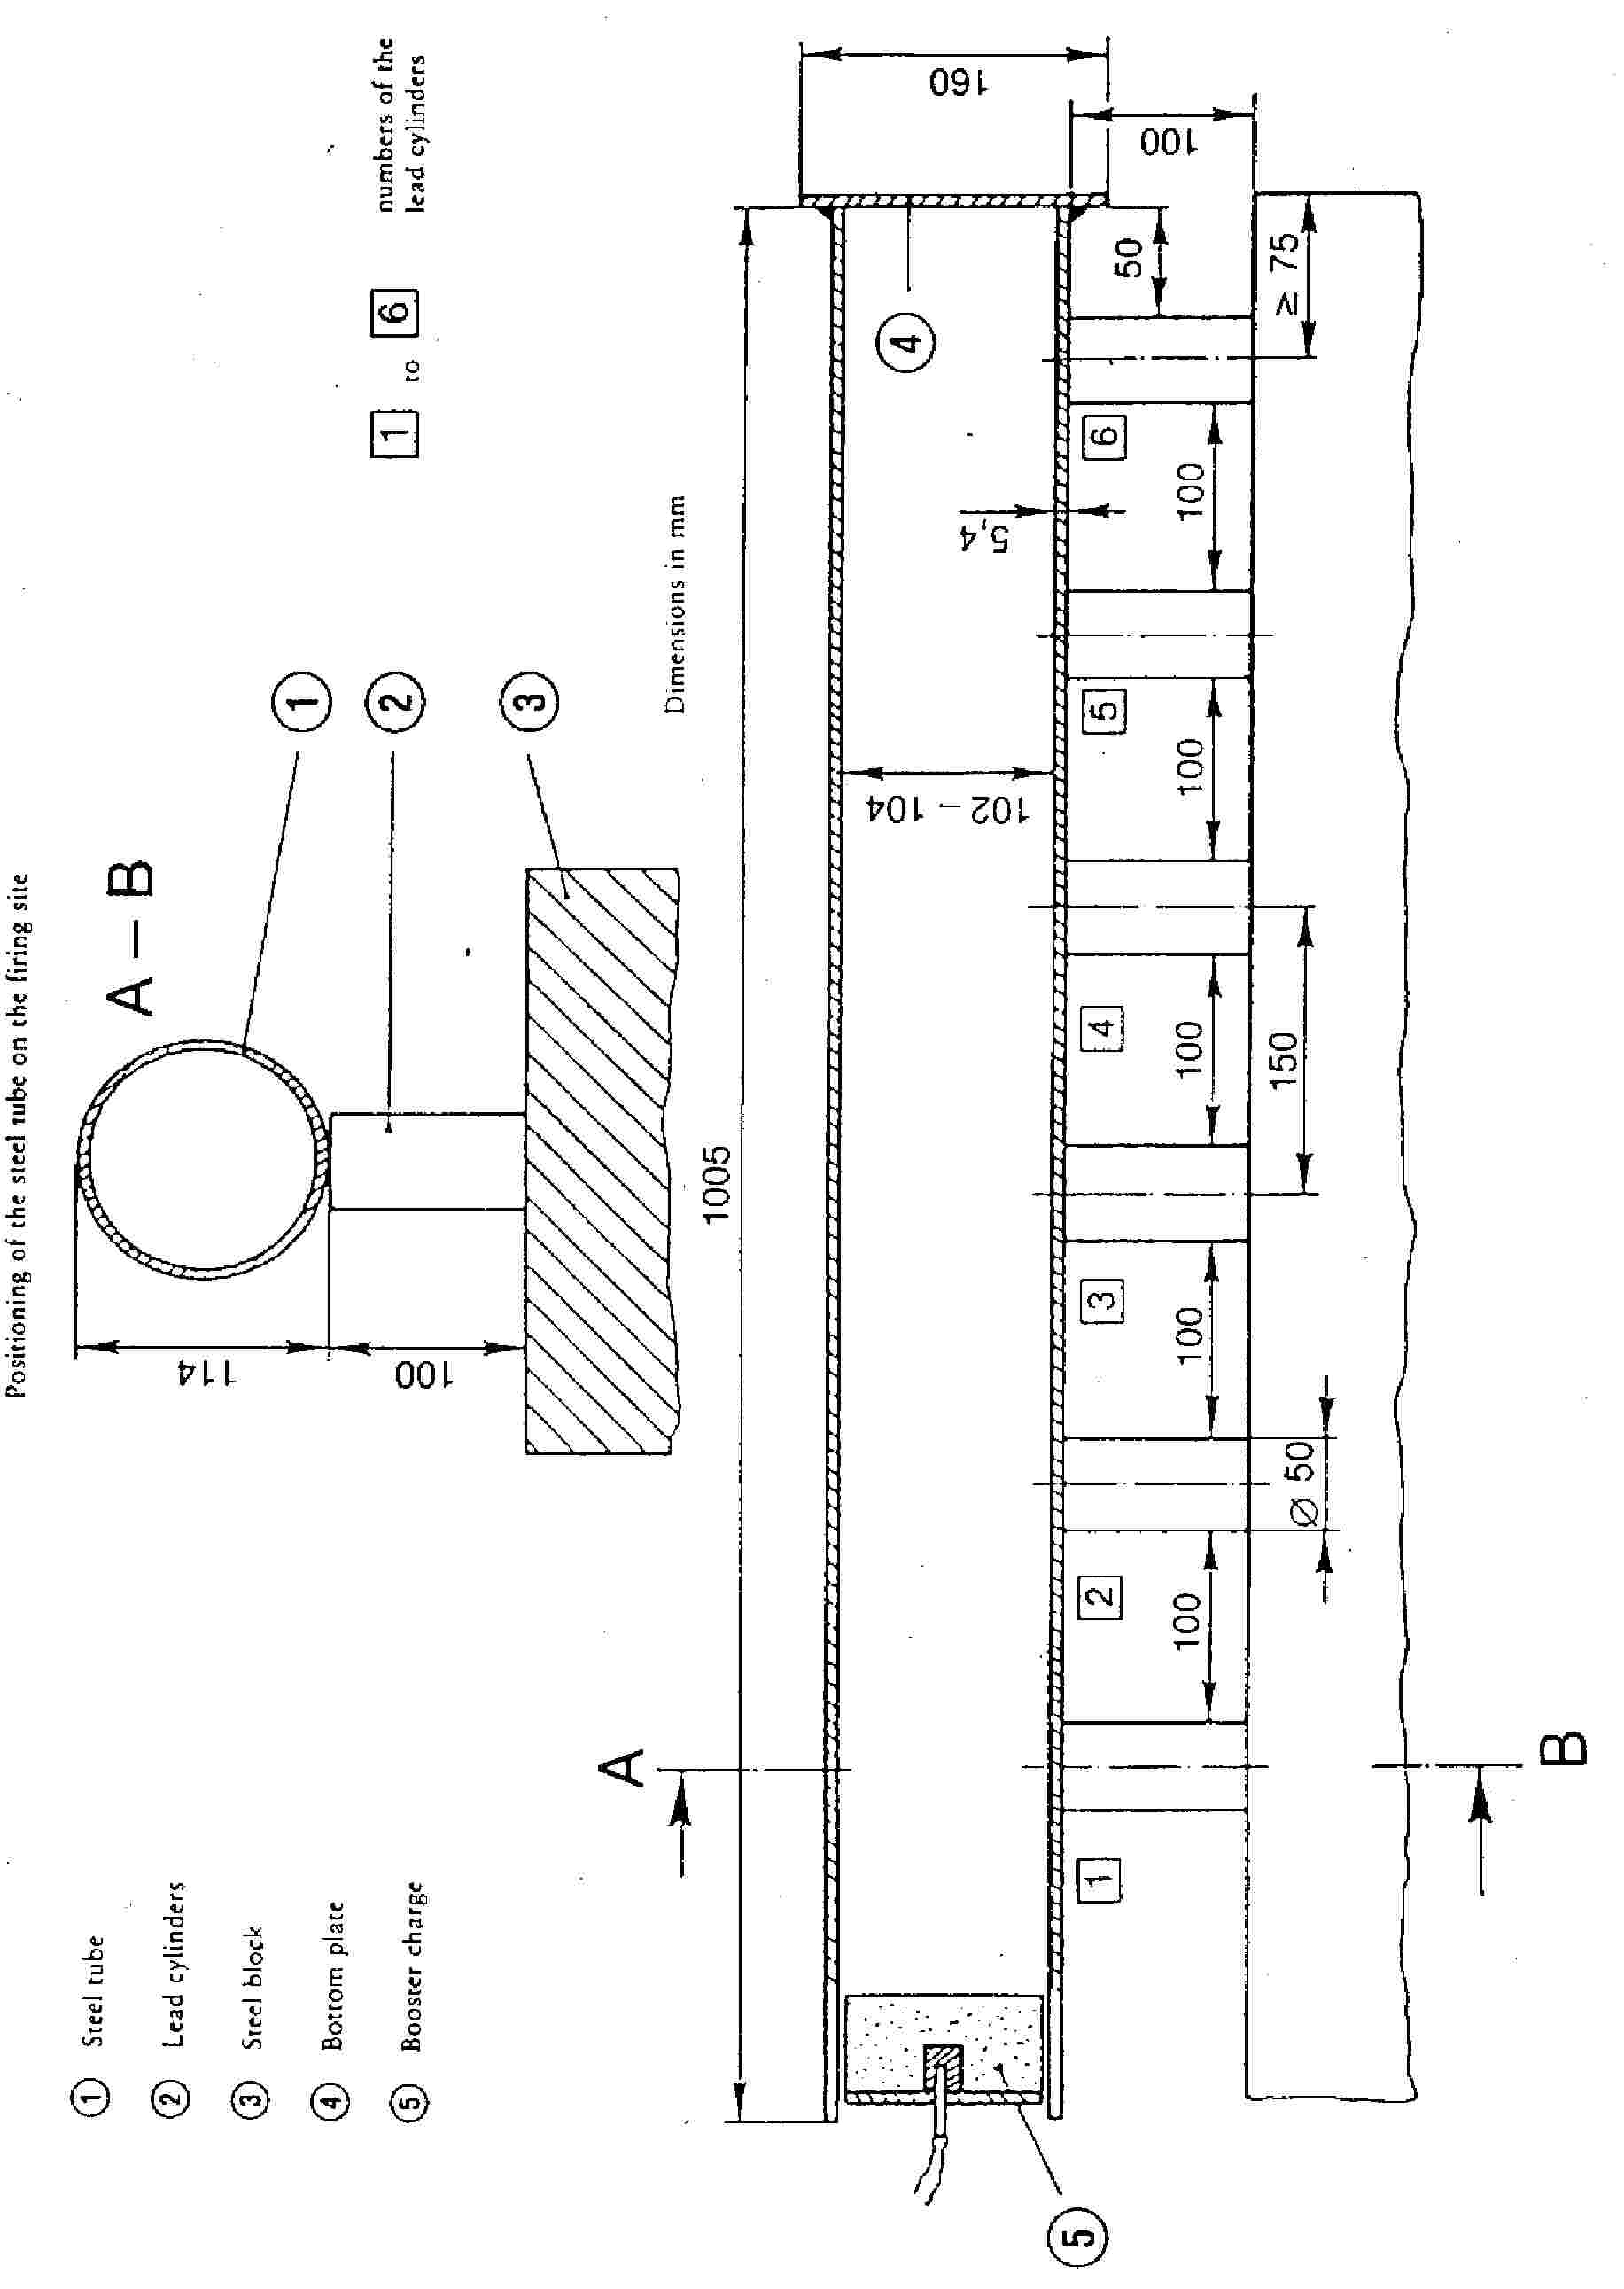 Eur Lex 02003r2003 20081128 Ga Wiring Diagrams For Lighting Circuits E2 80 93 Junction Box Method Image